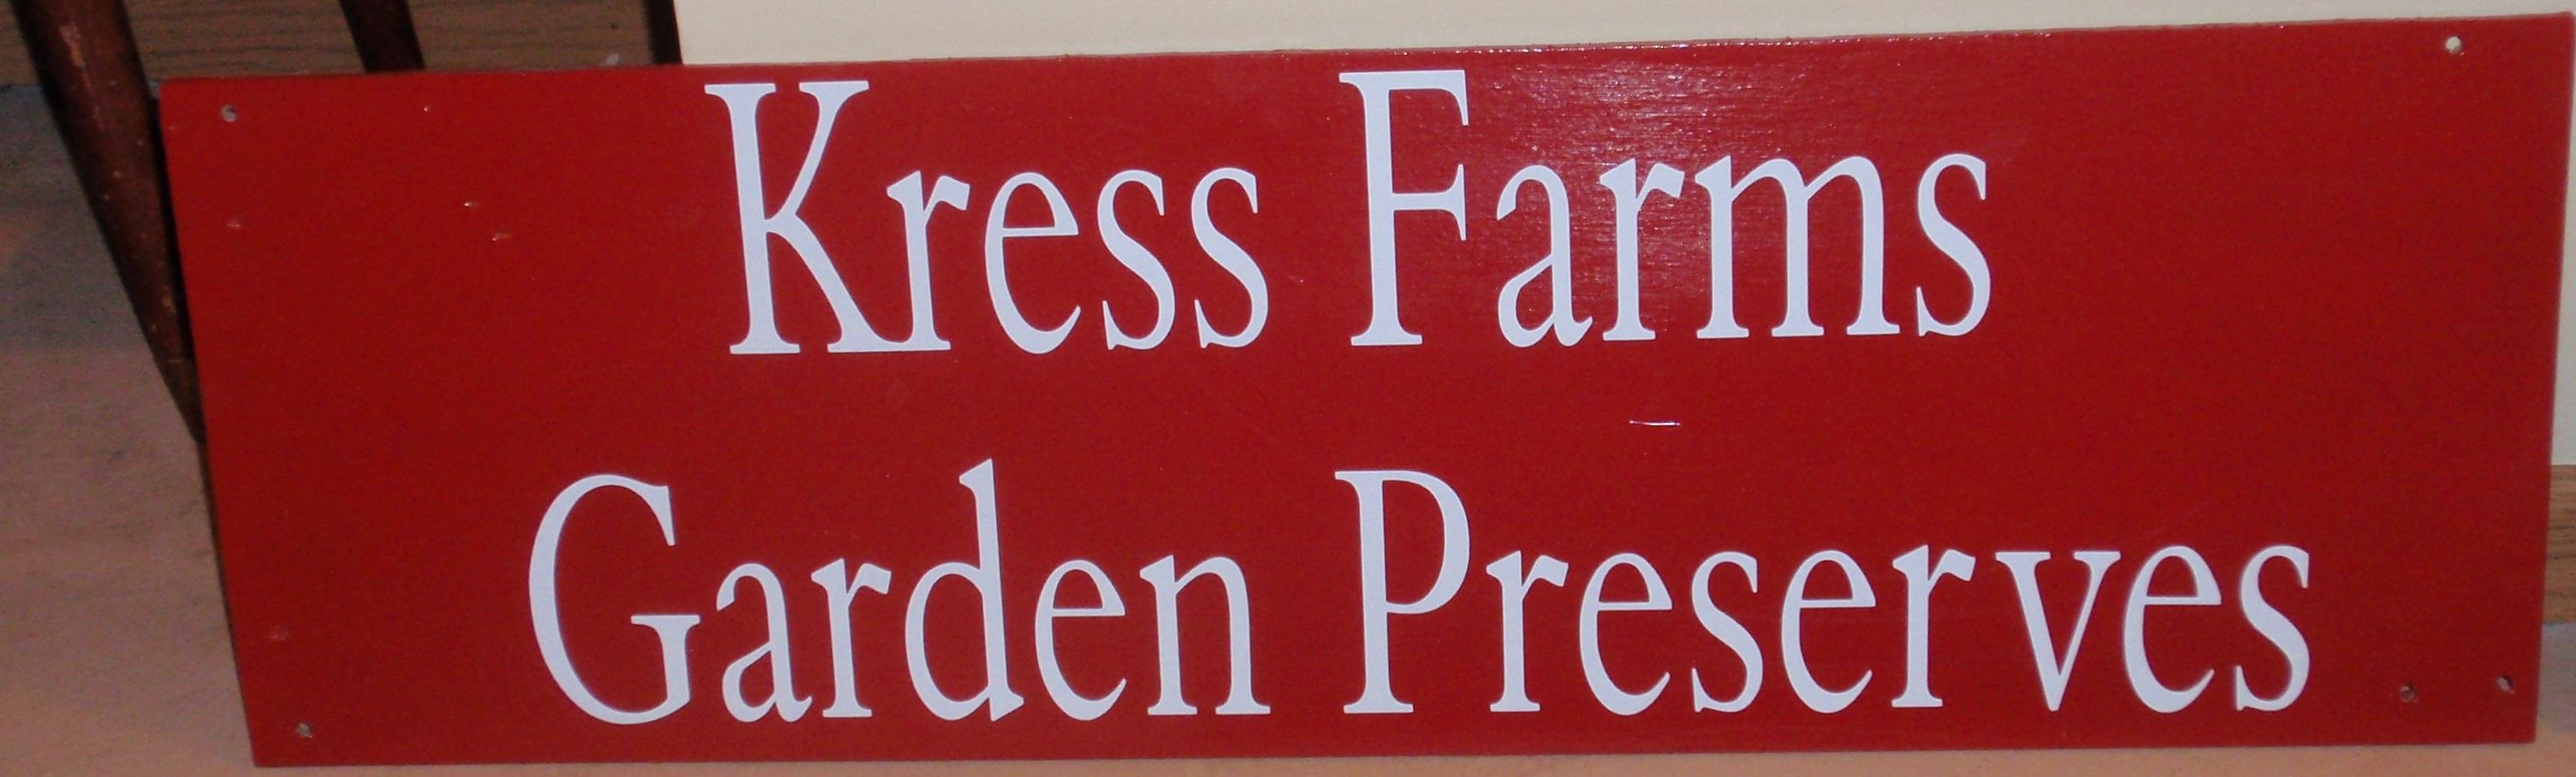 Kredd Farms